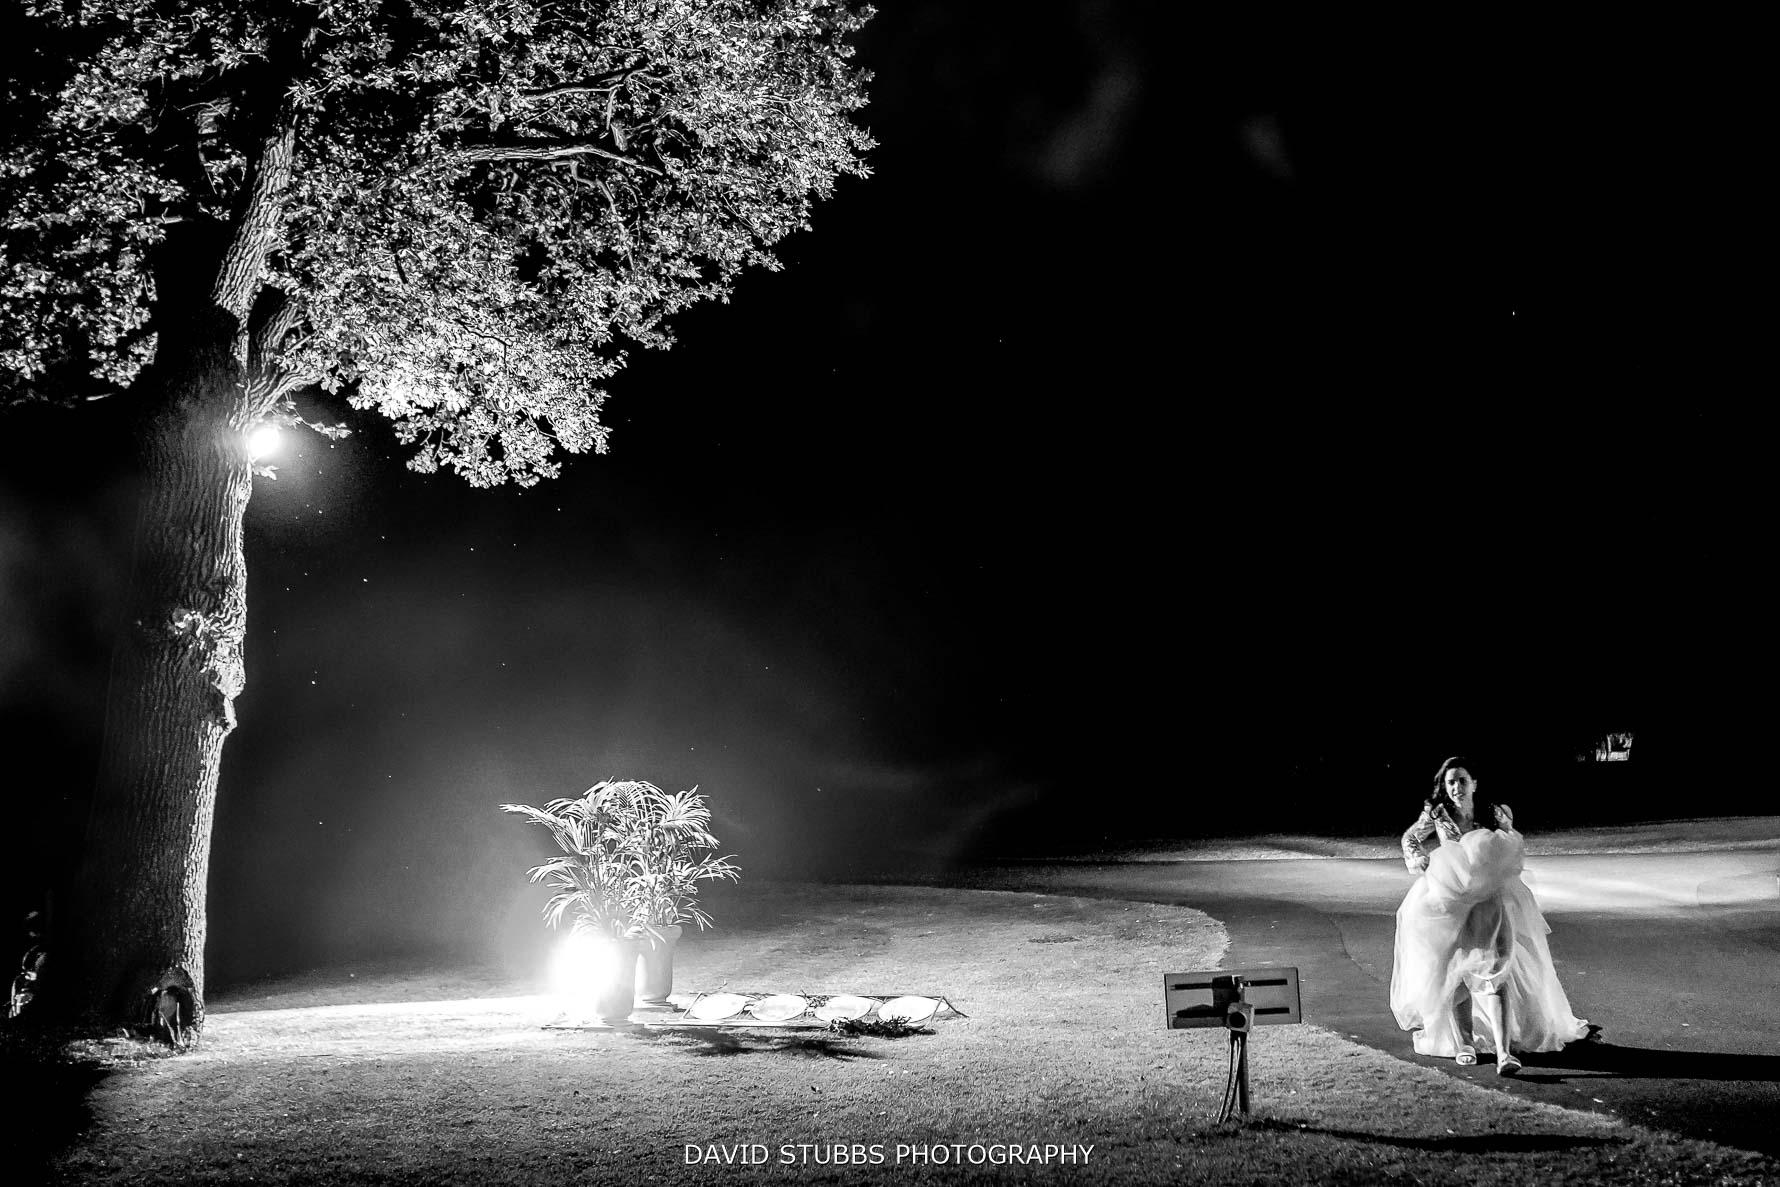 nighttime photo merrydale manor